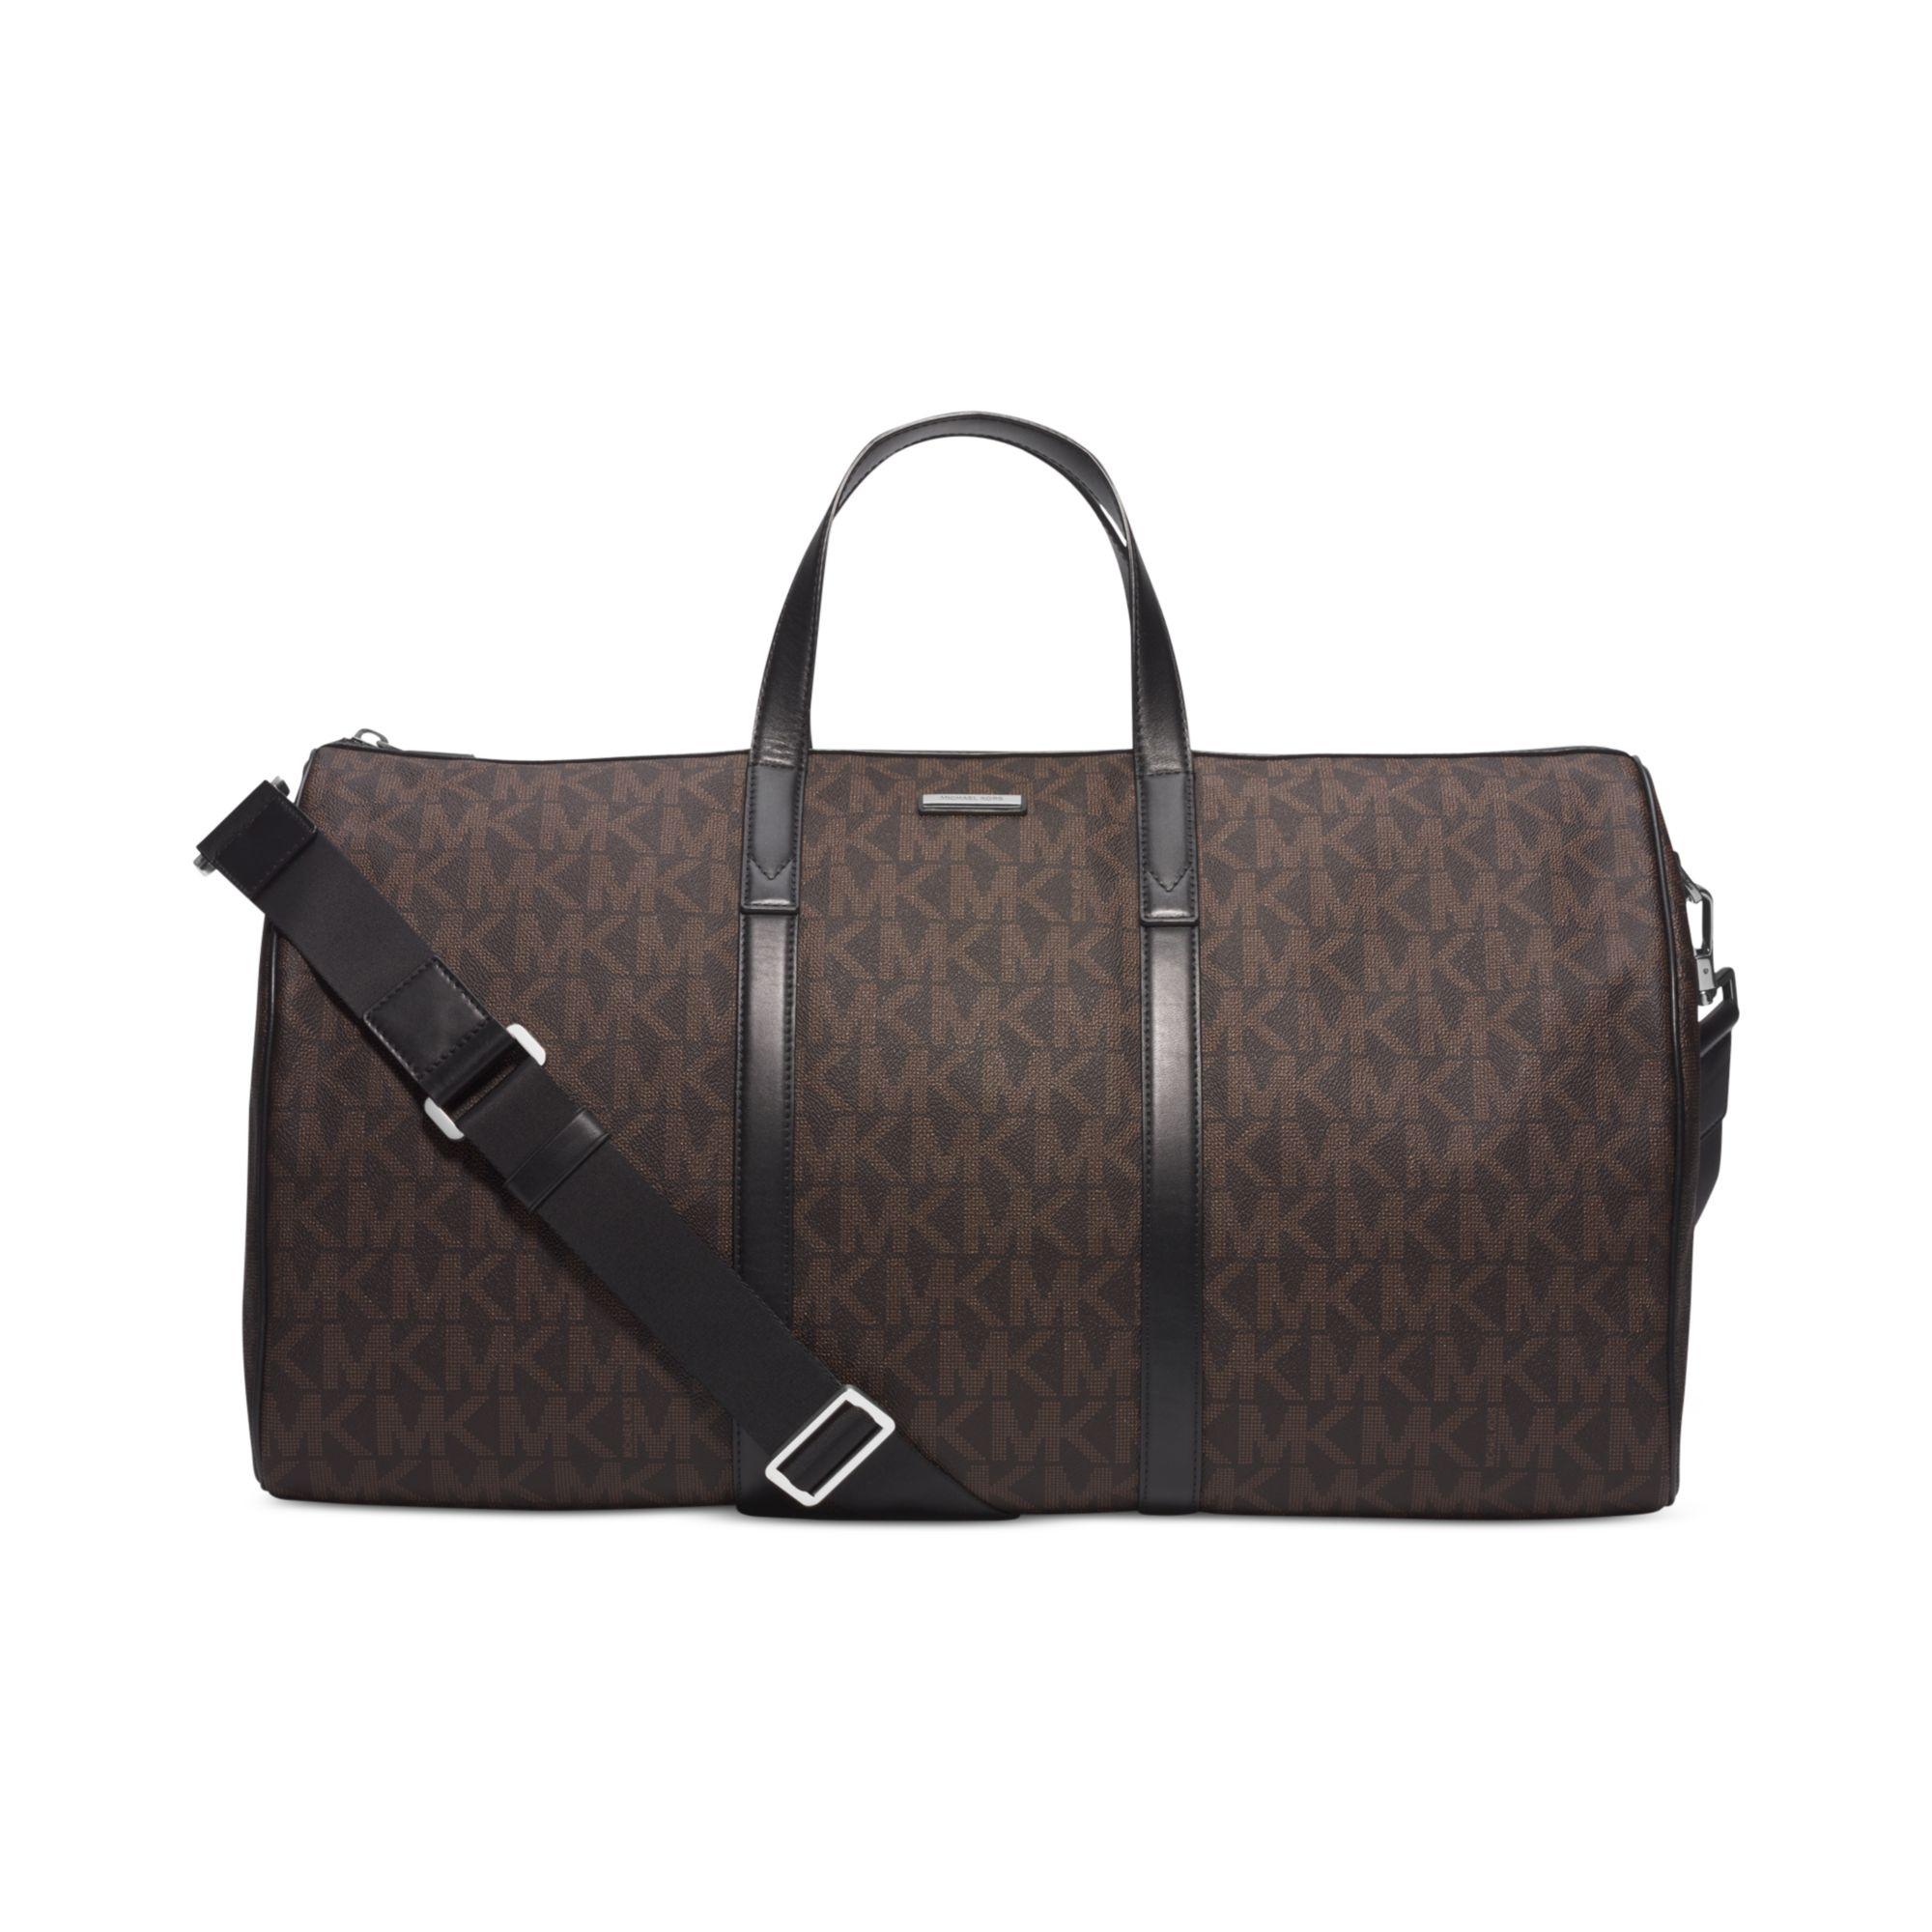 898038ef88fef5 Michael Kors Signature Logo Jet Set Travel Duffle Bag in Brown for ...